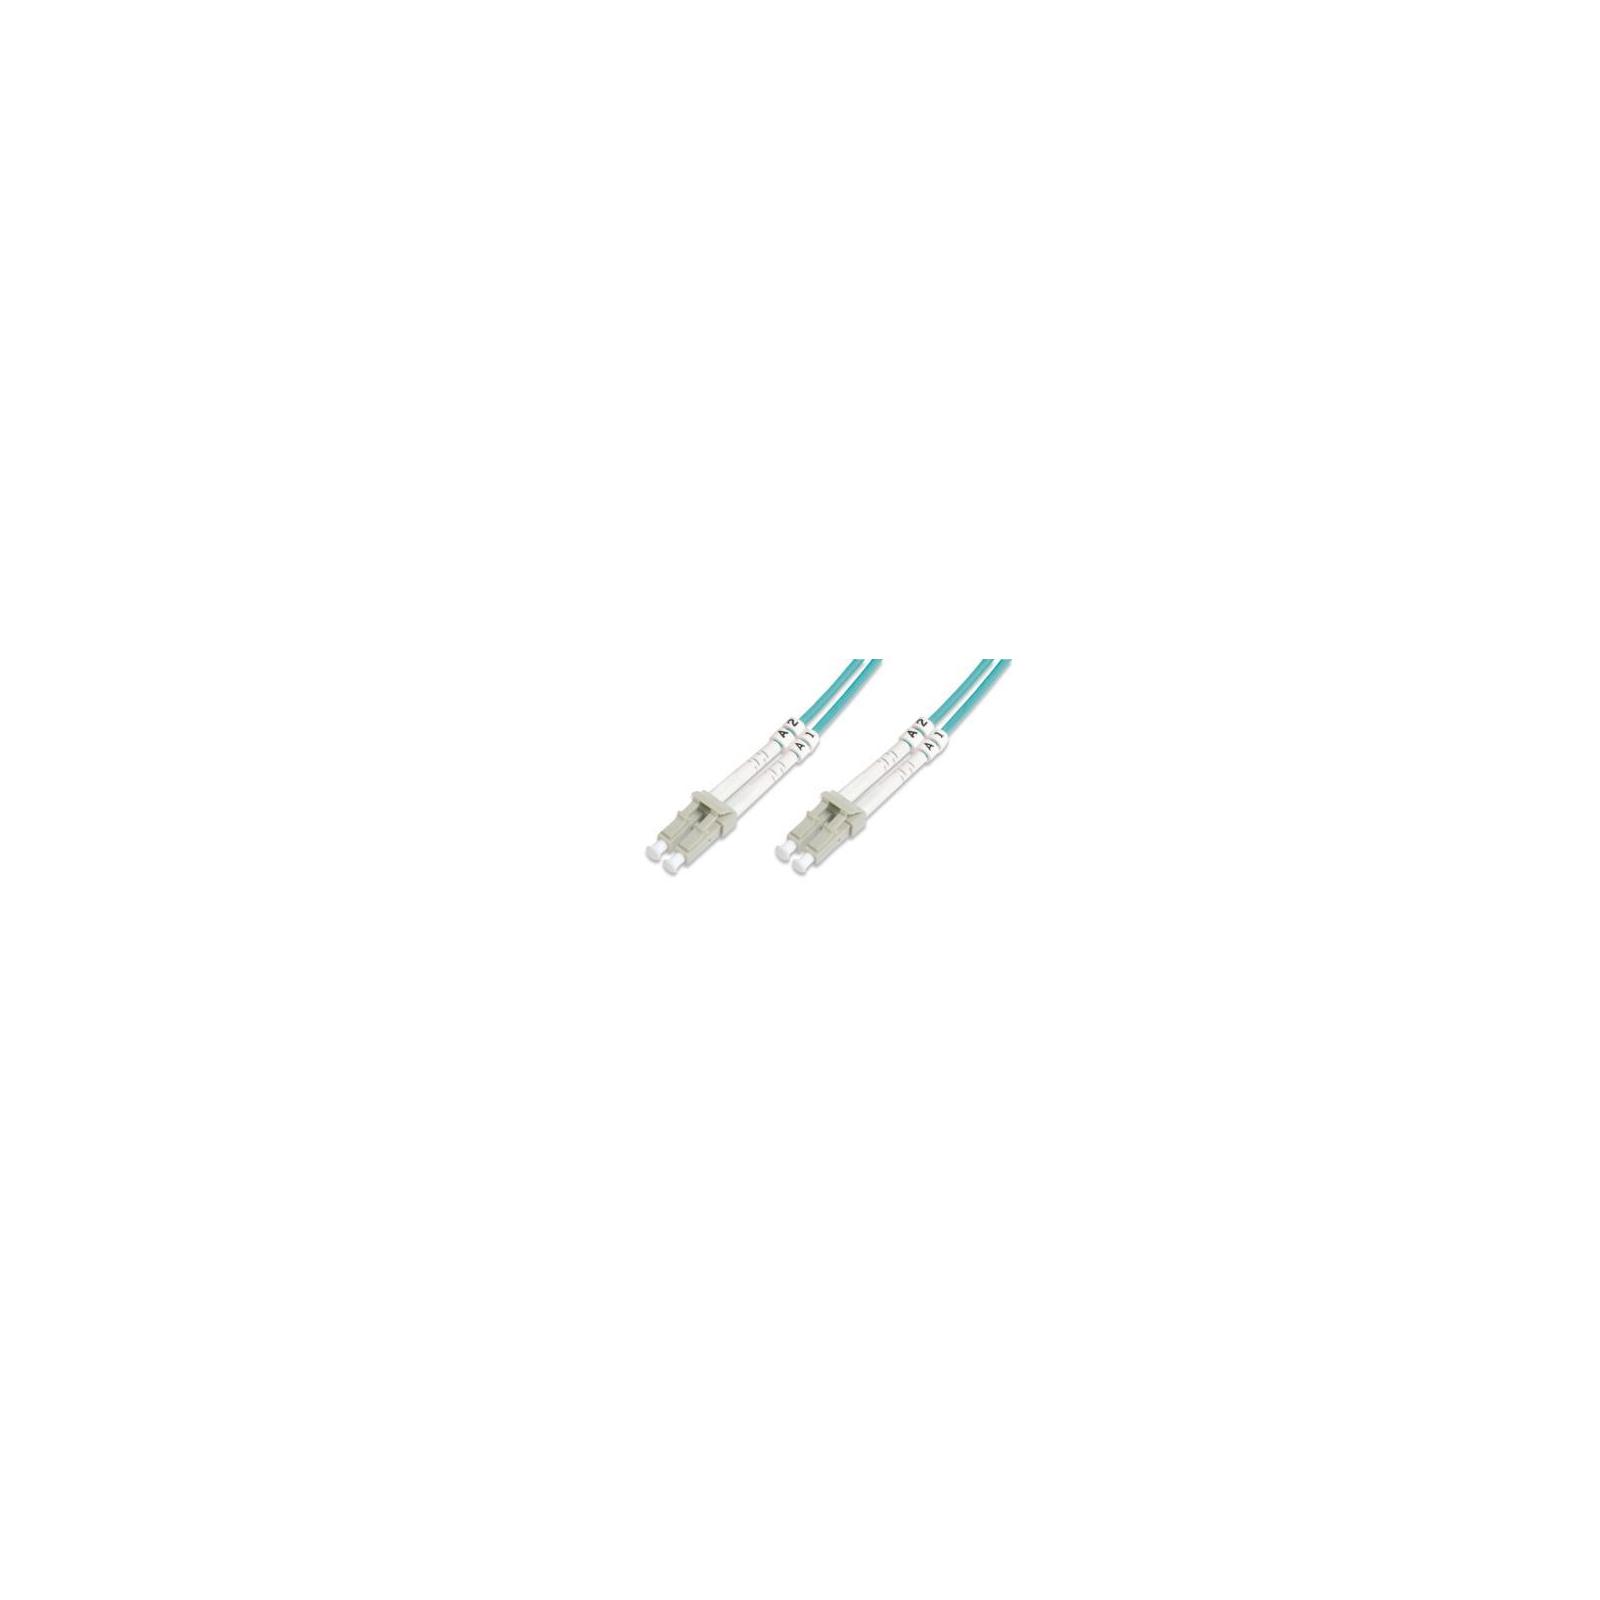 Оптичний патчкорд DIGITUS LC/UPC-LC/UPC,50/125,OM3(Multimode),Duplex,20m (DK-2533-20/3)